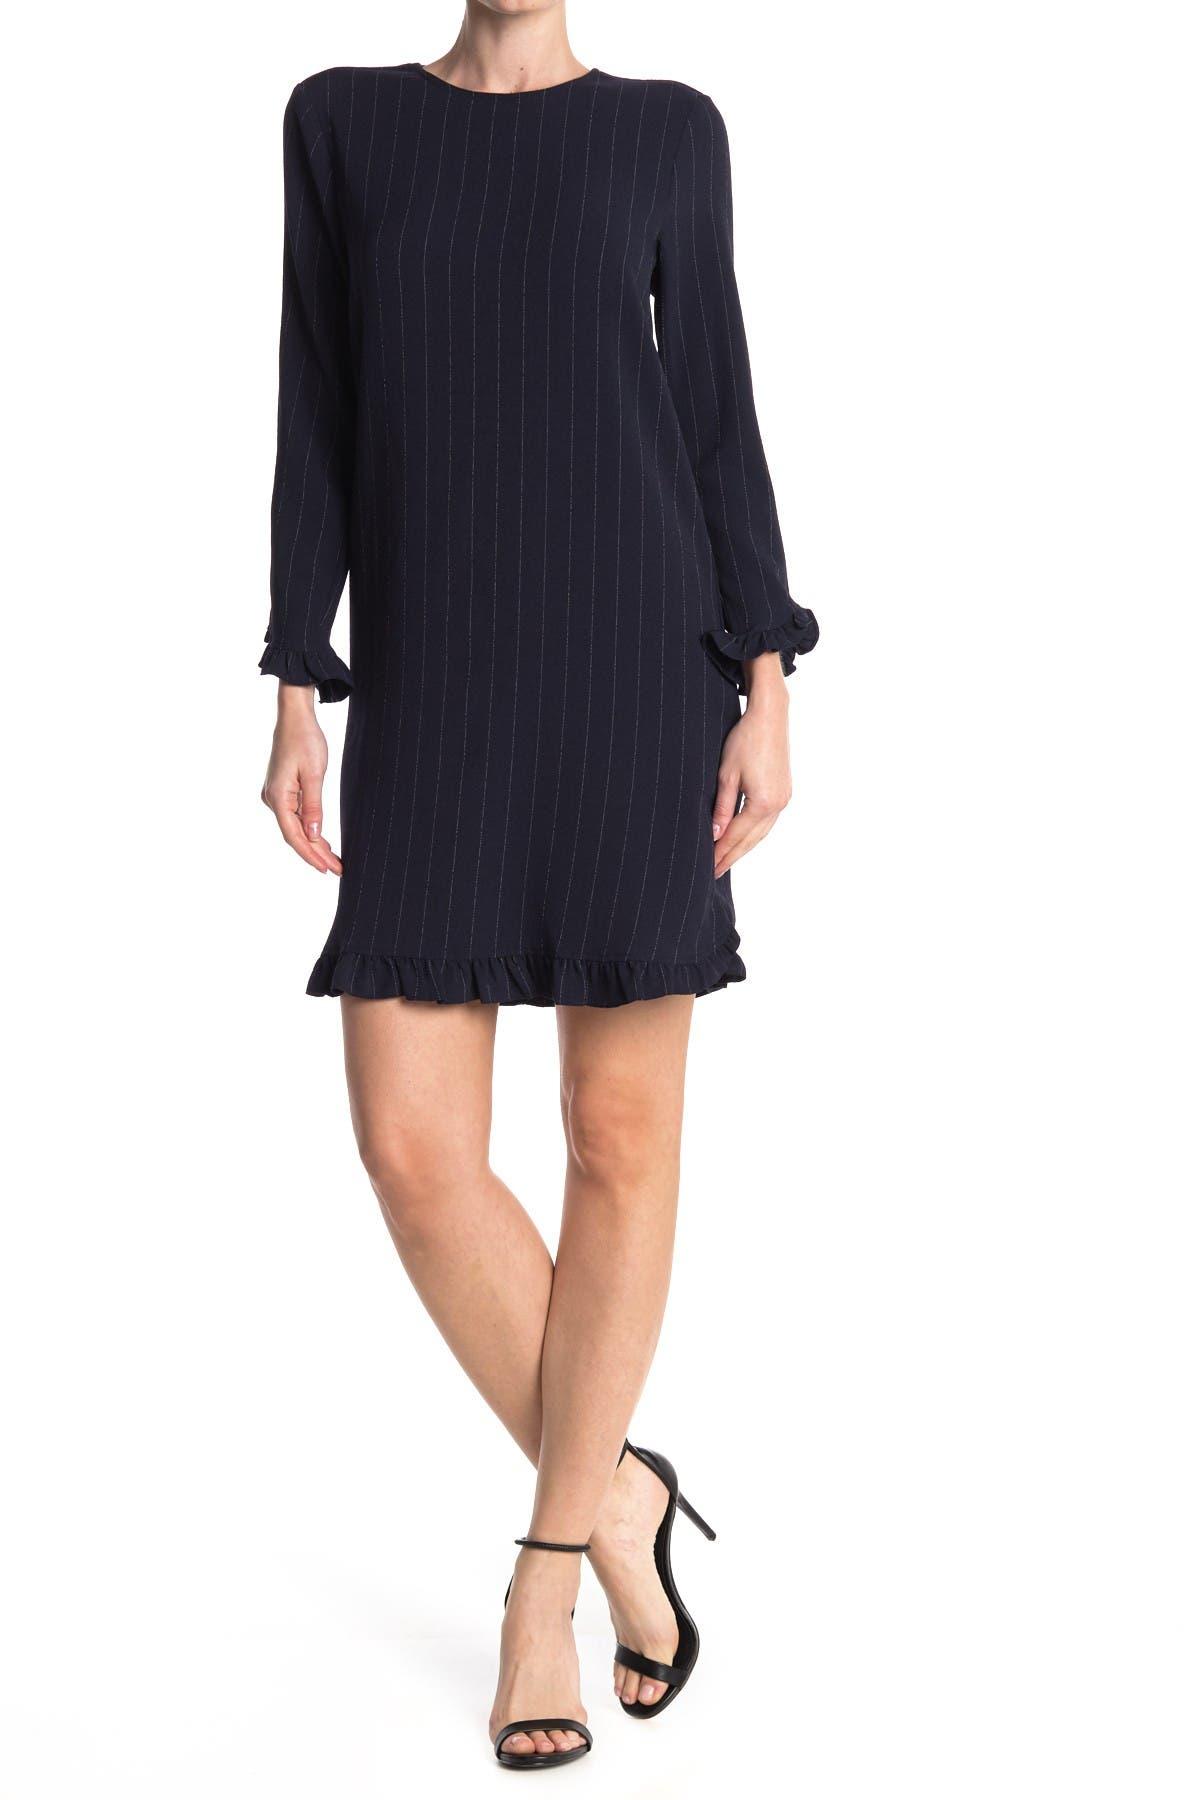 Image of GANNI Heavy Crepemini Ruffle Dress